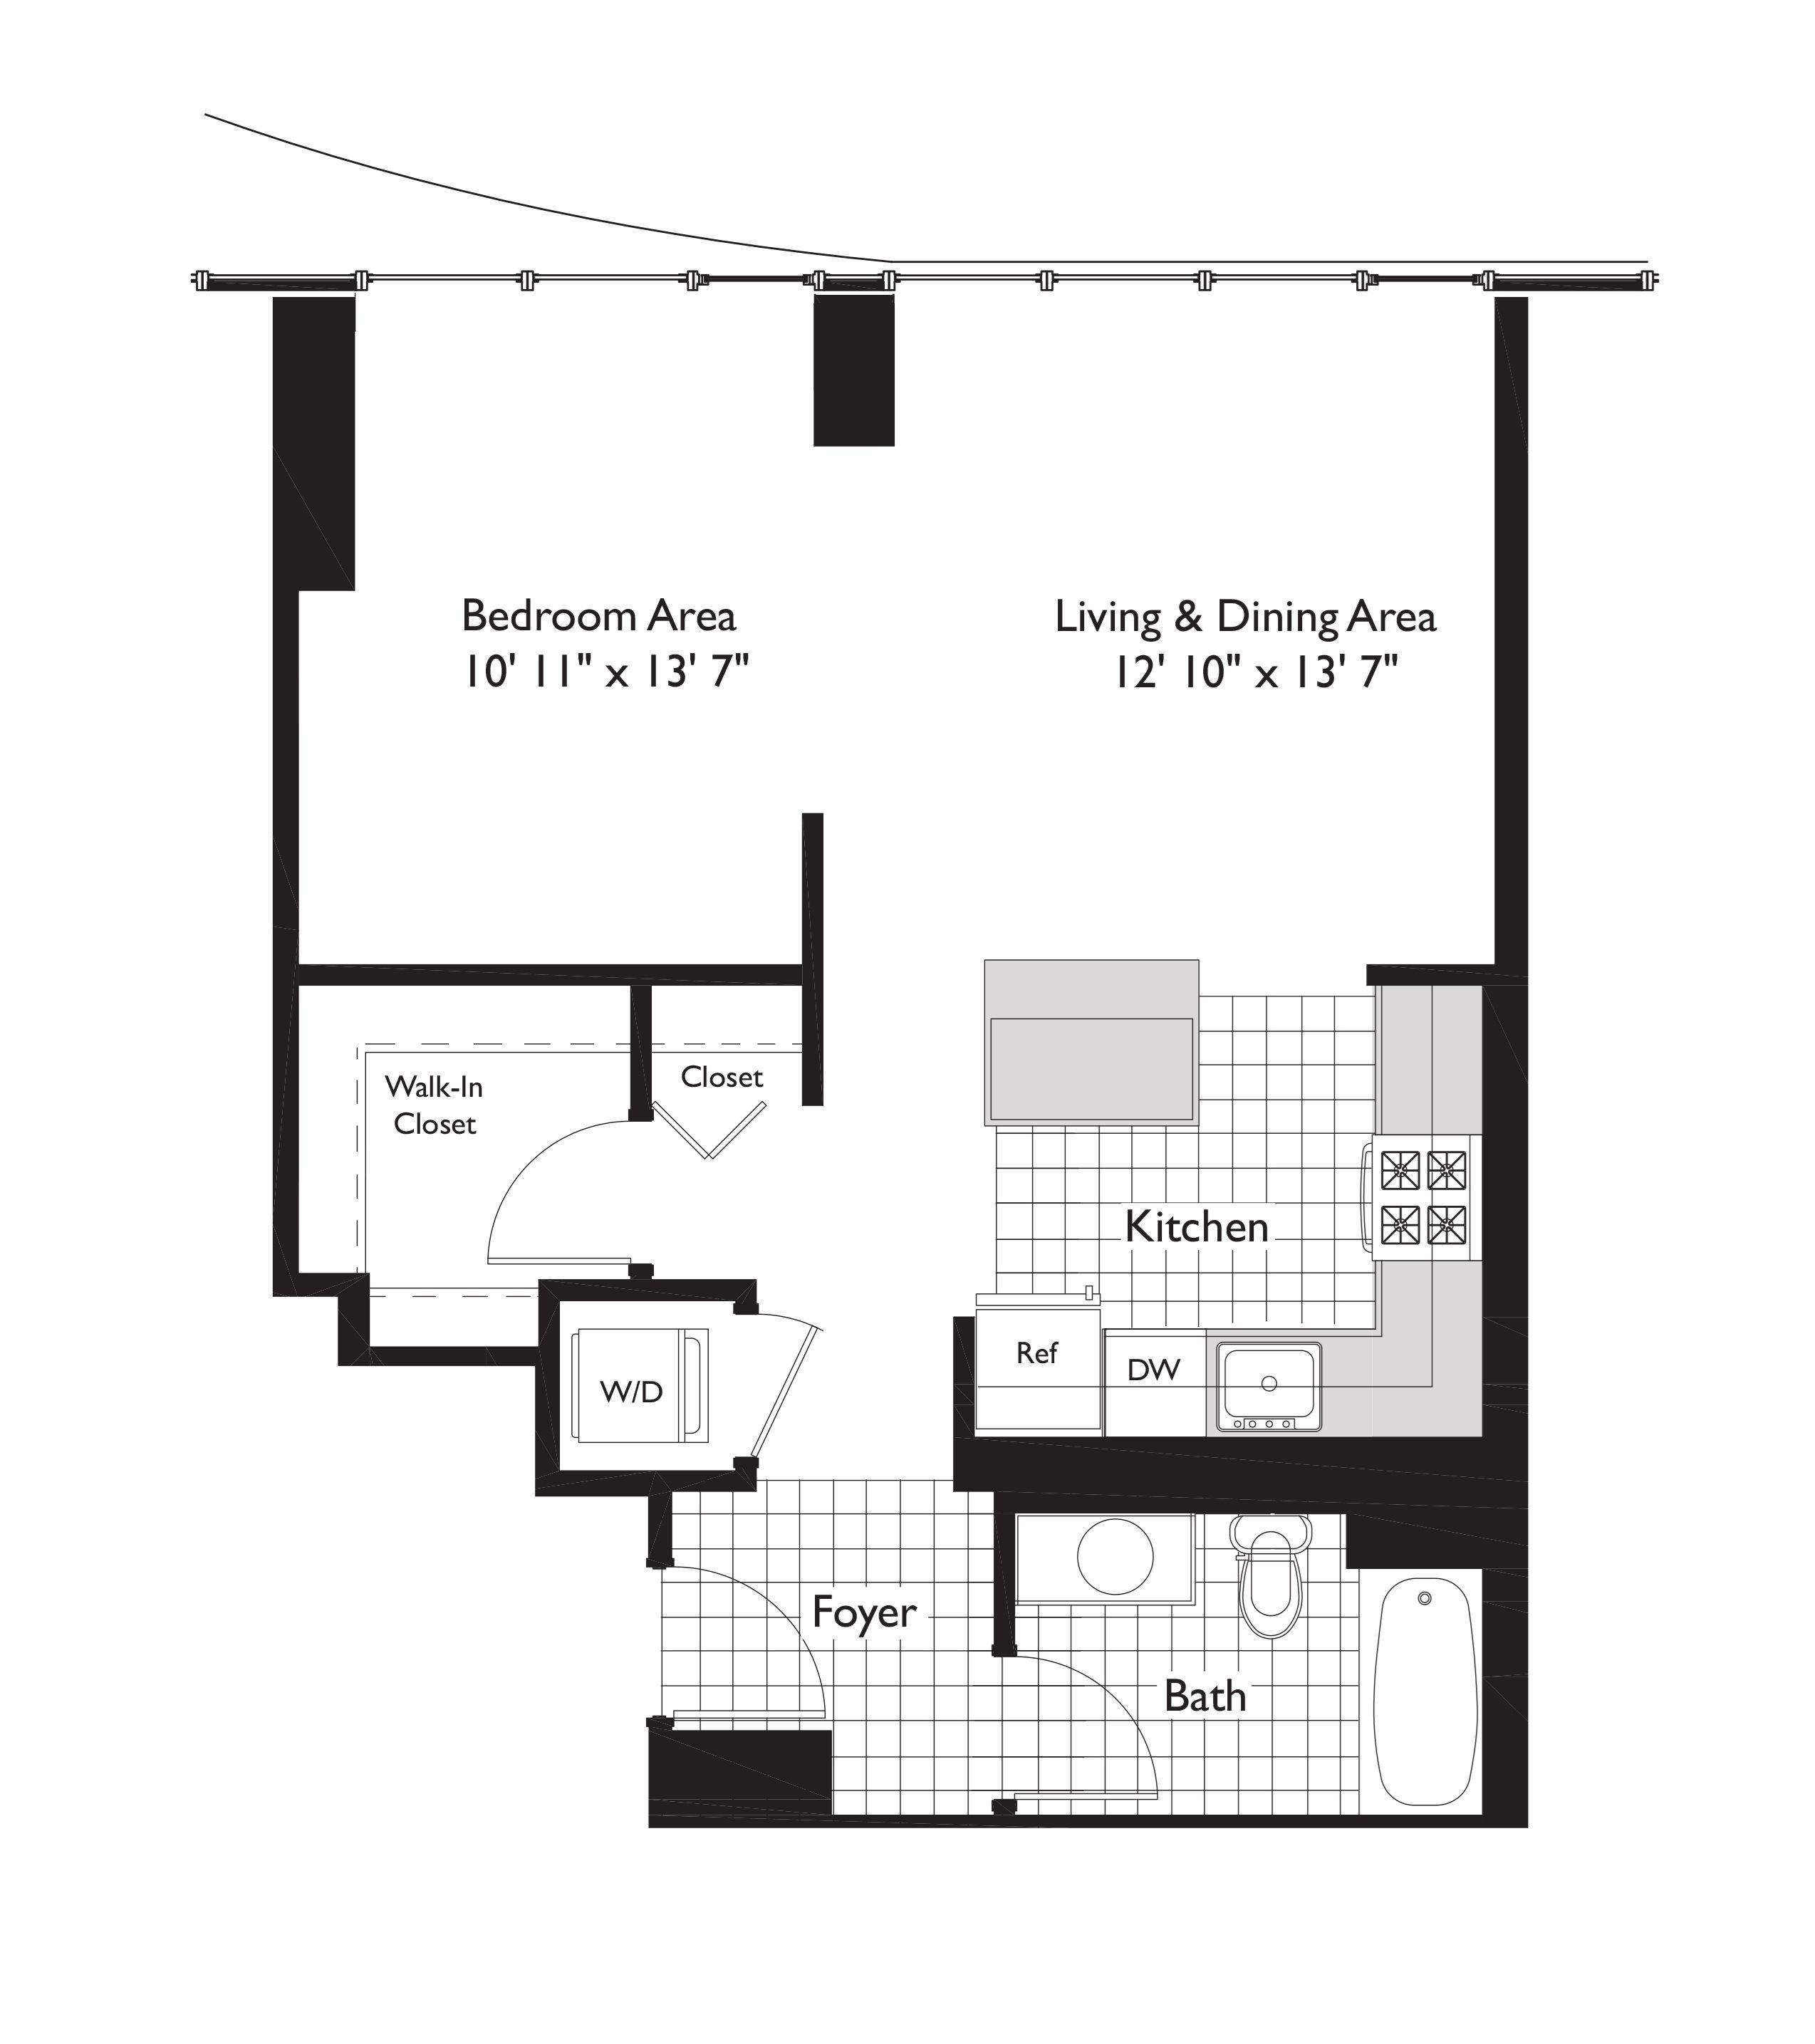 Studio, 1 & 2 Bedroom Apartments In Lakeshore East